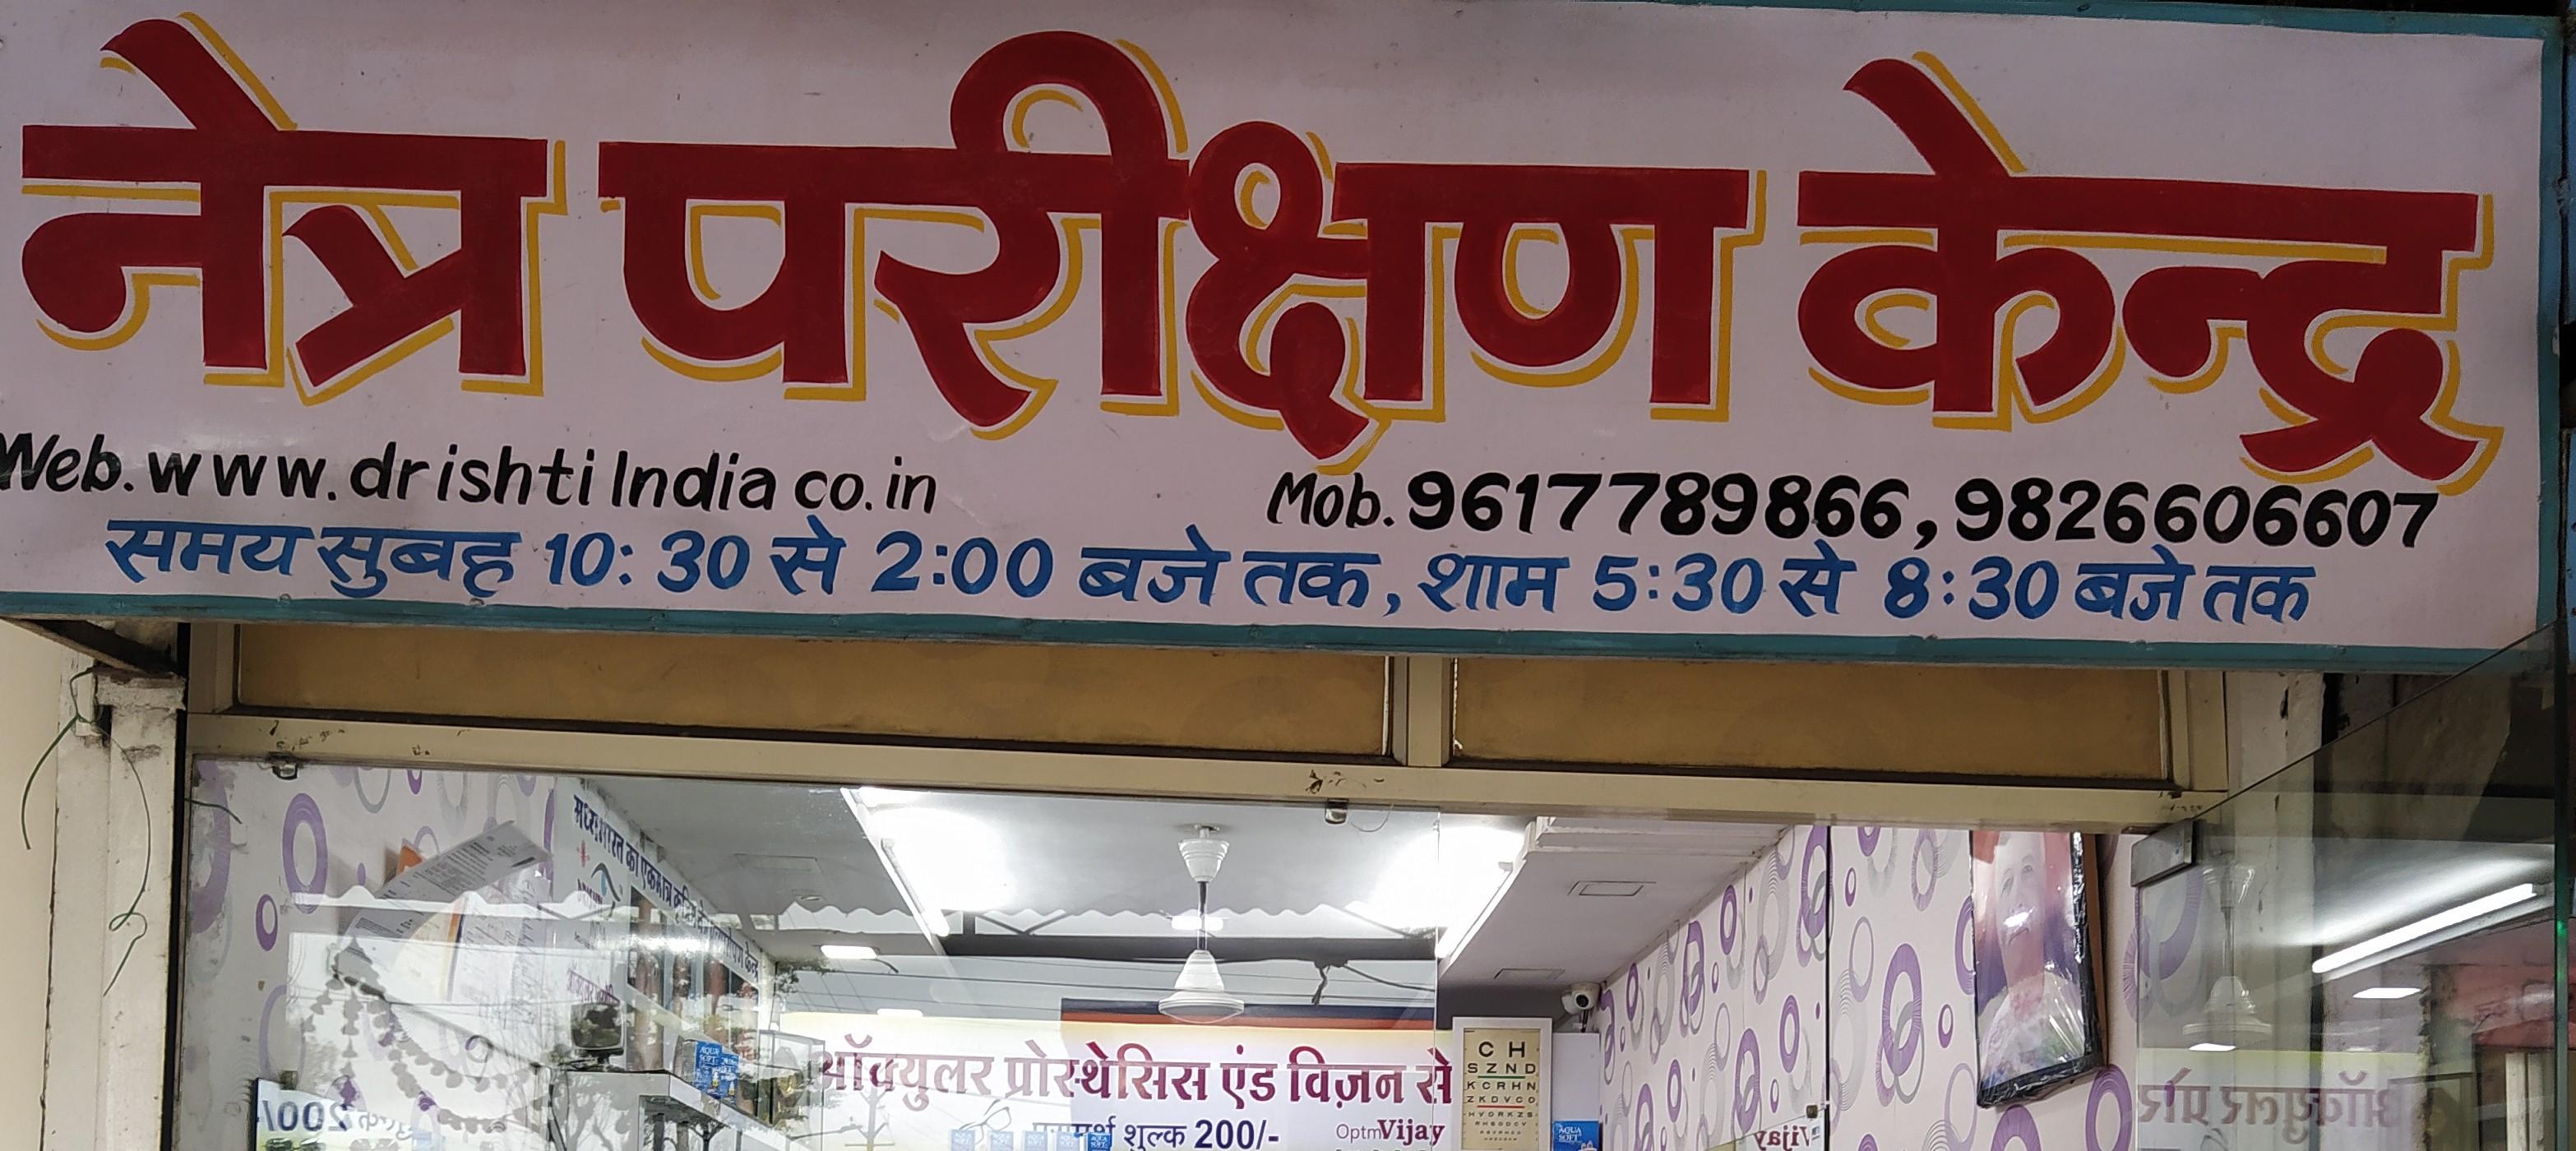 DRISHTI INDIA OCULAR PROSTHESIS AND VISION CENTER